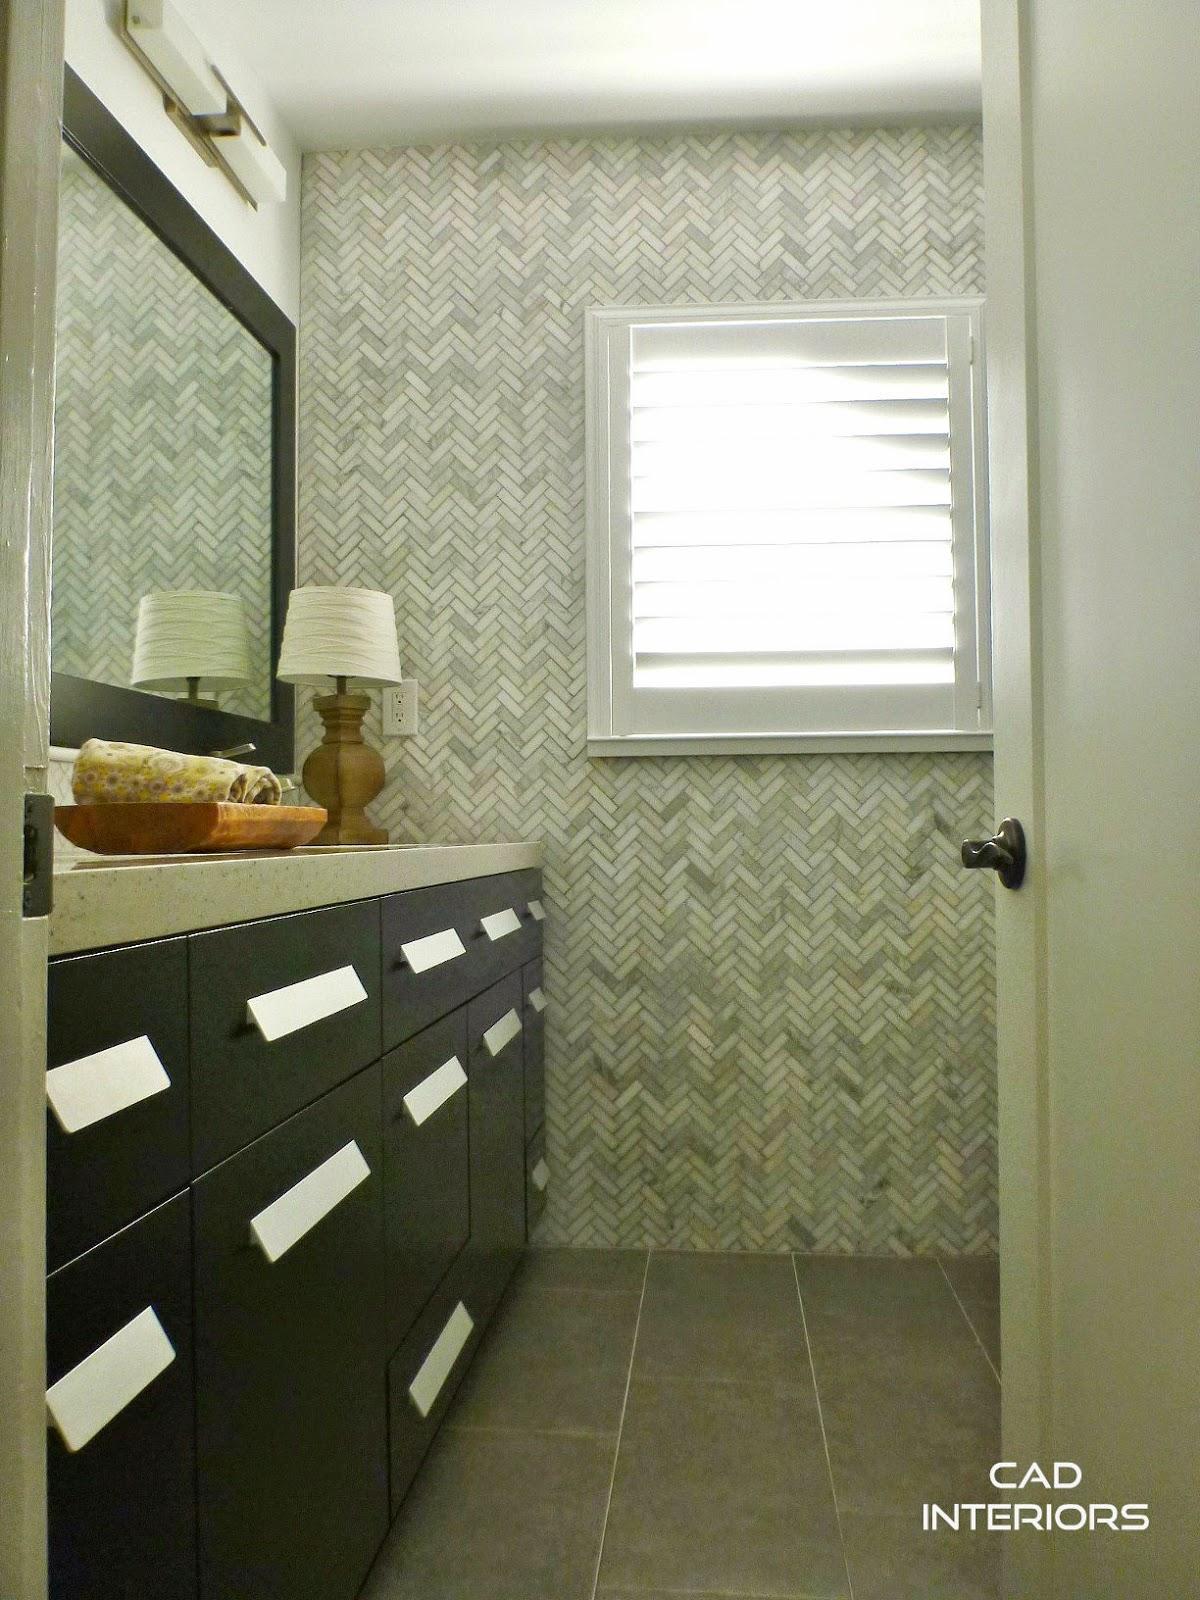 vanity herringbone tile quartz countertop 84 inch double vanity sinks